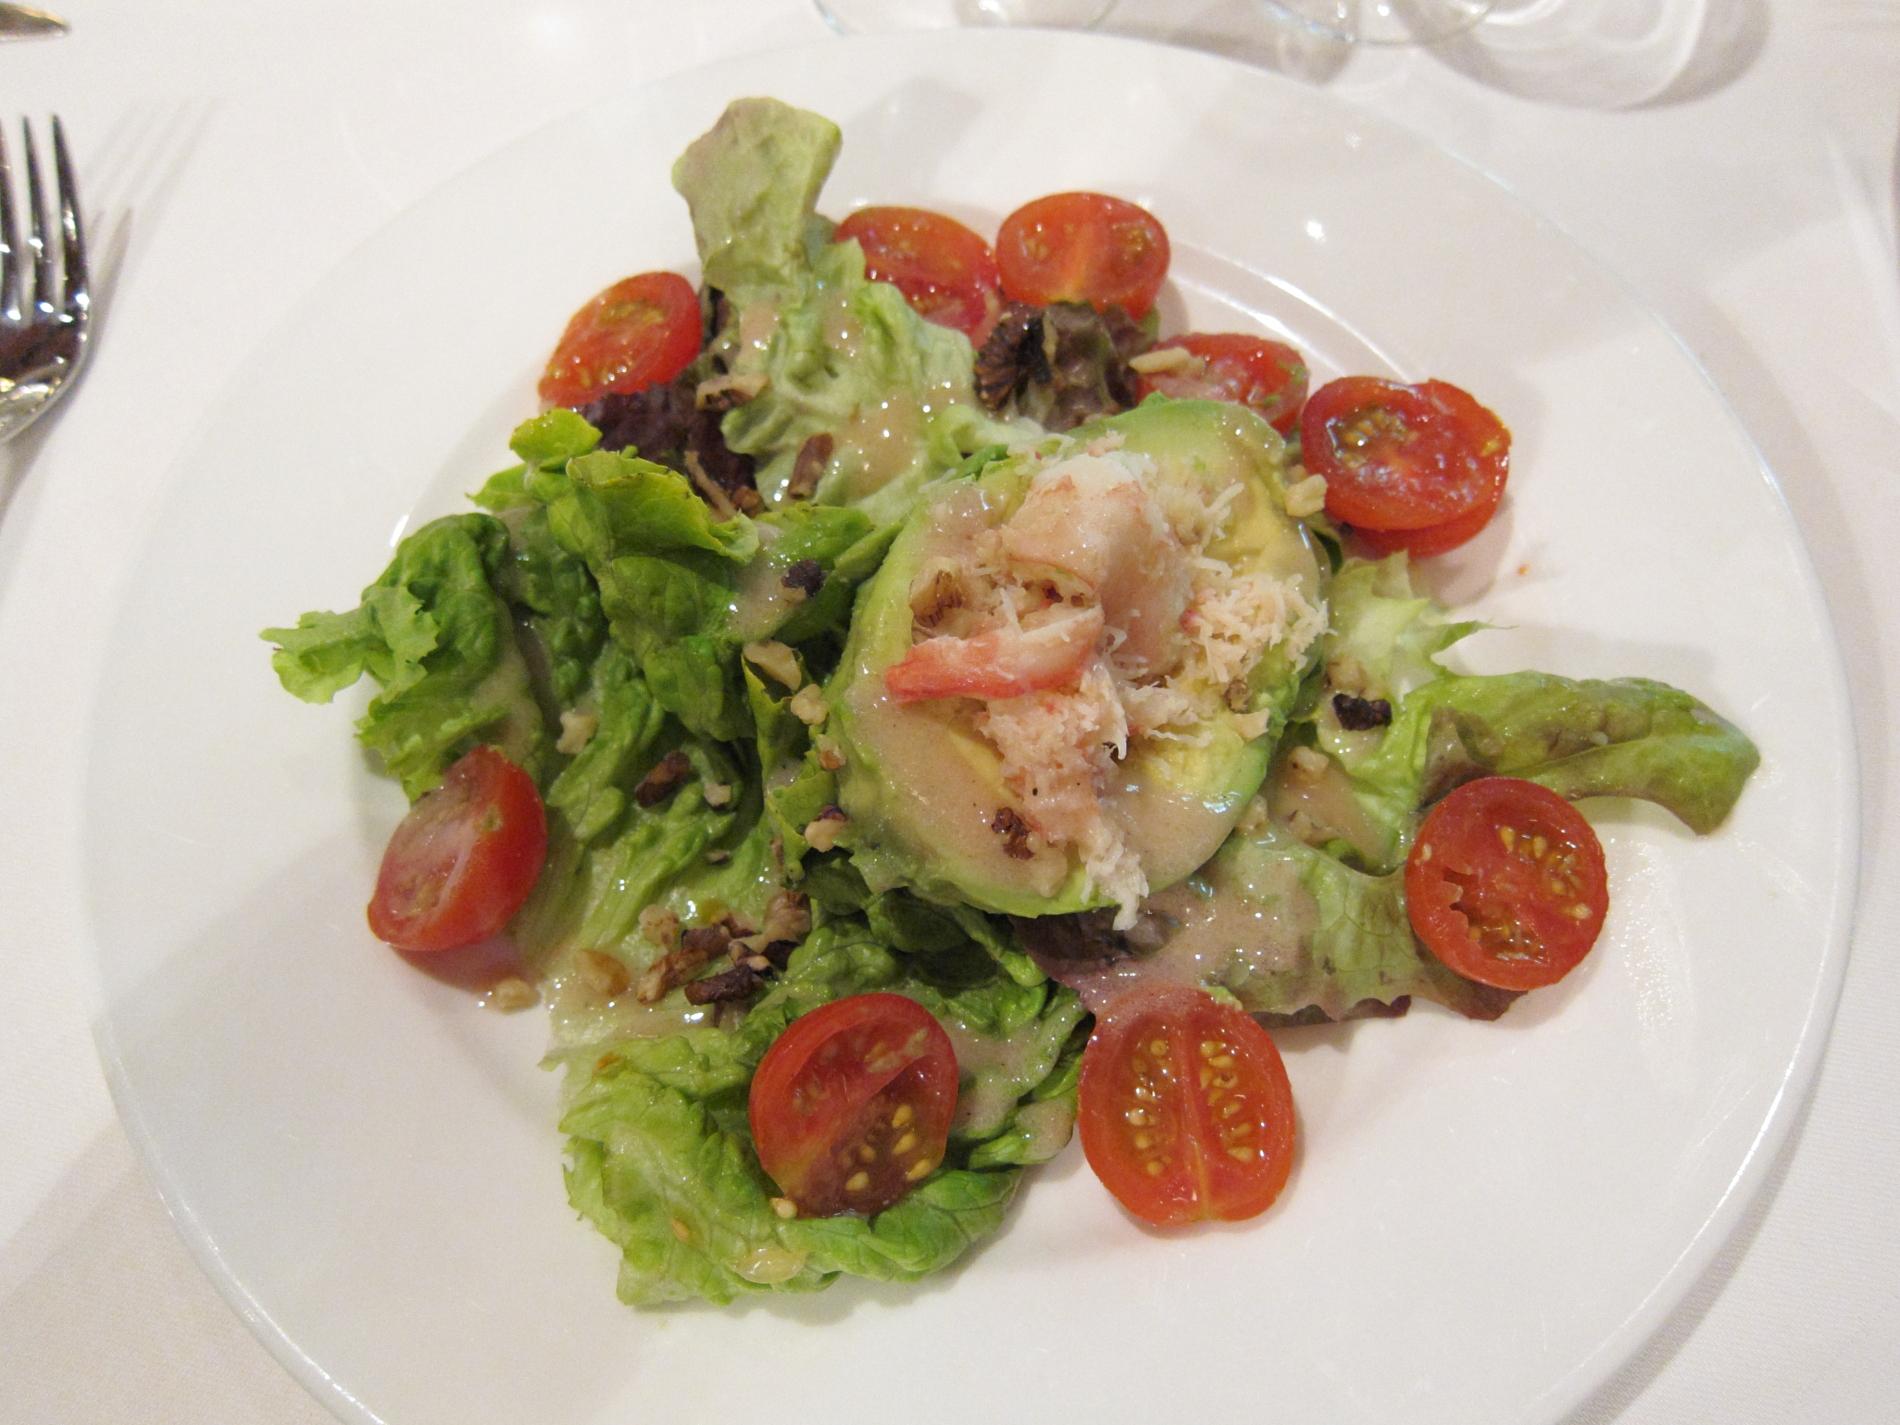 Bob's entrée at the Restaurant du Grand Saint Michel in Chambord.